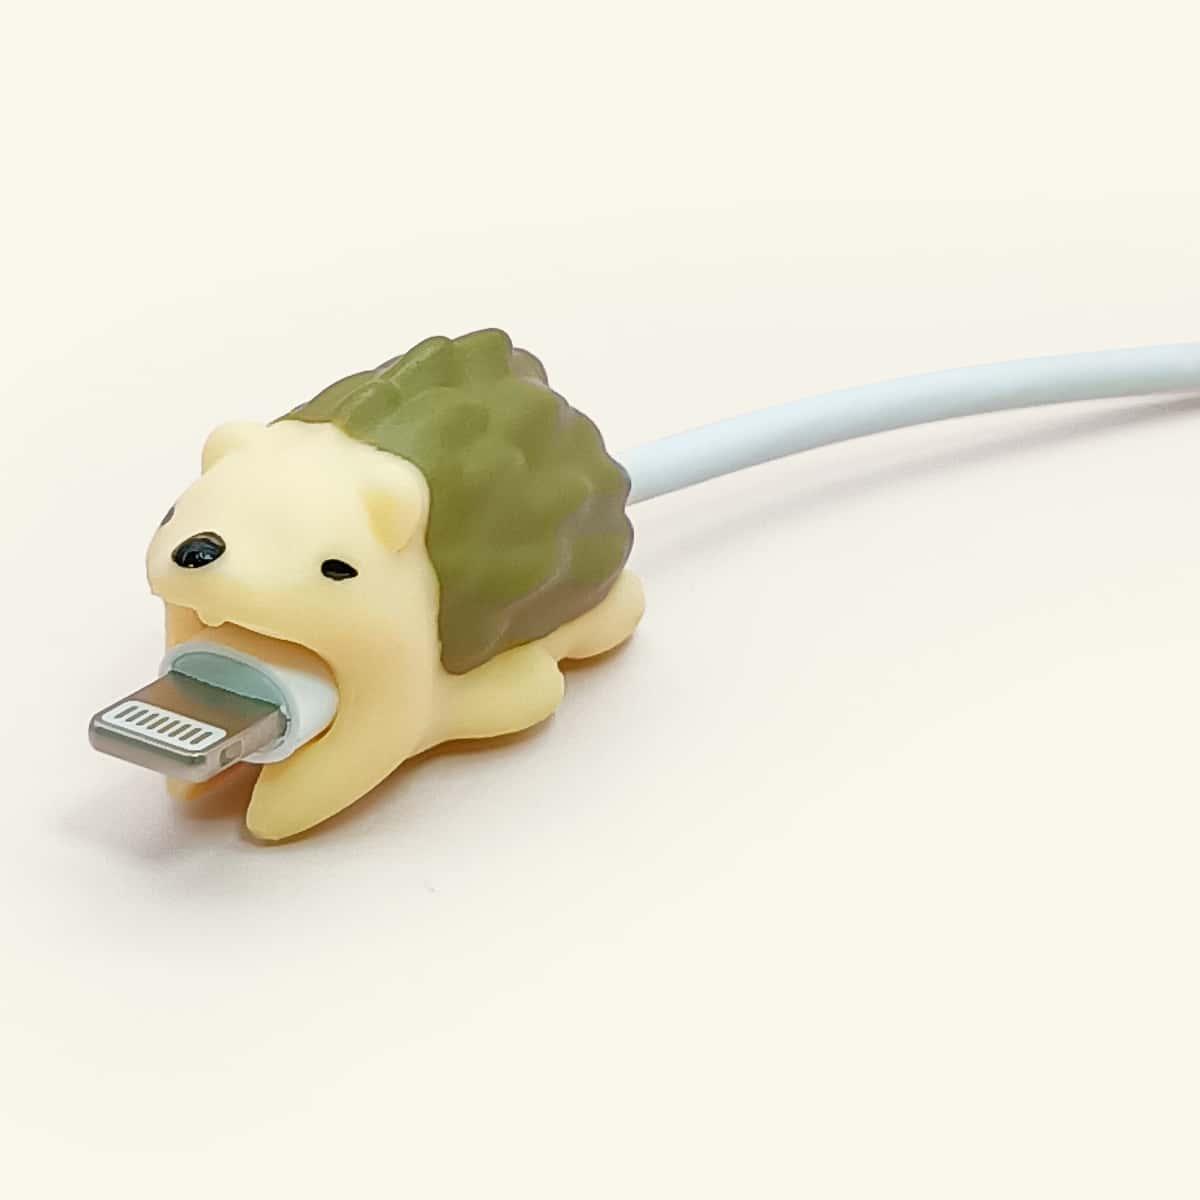 Cartoon Hedgehog Design Data Cable Protector